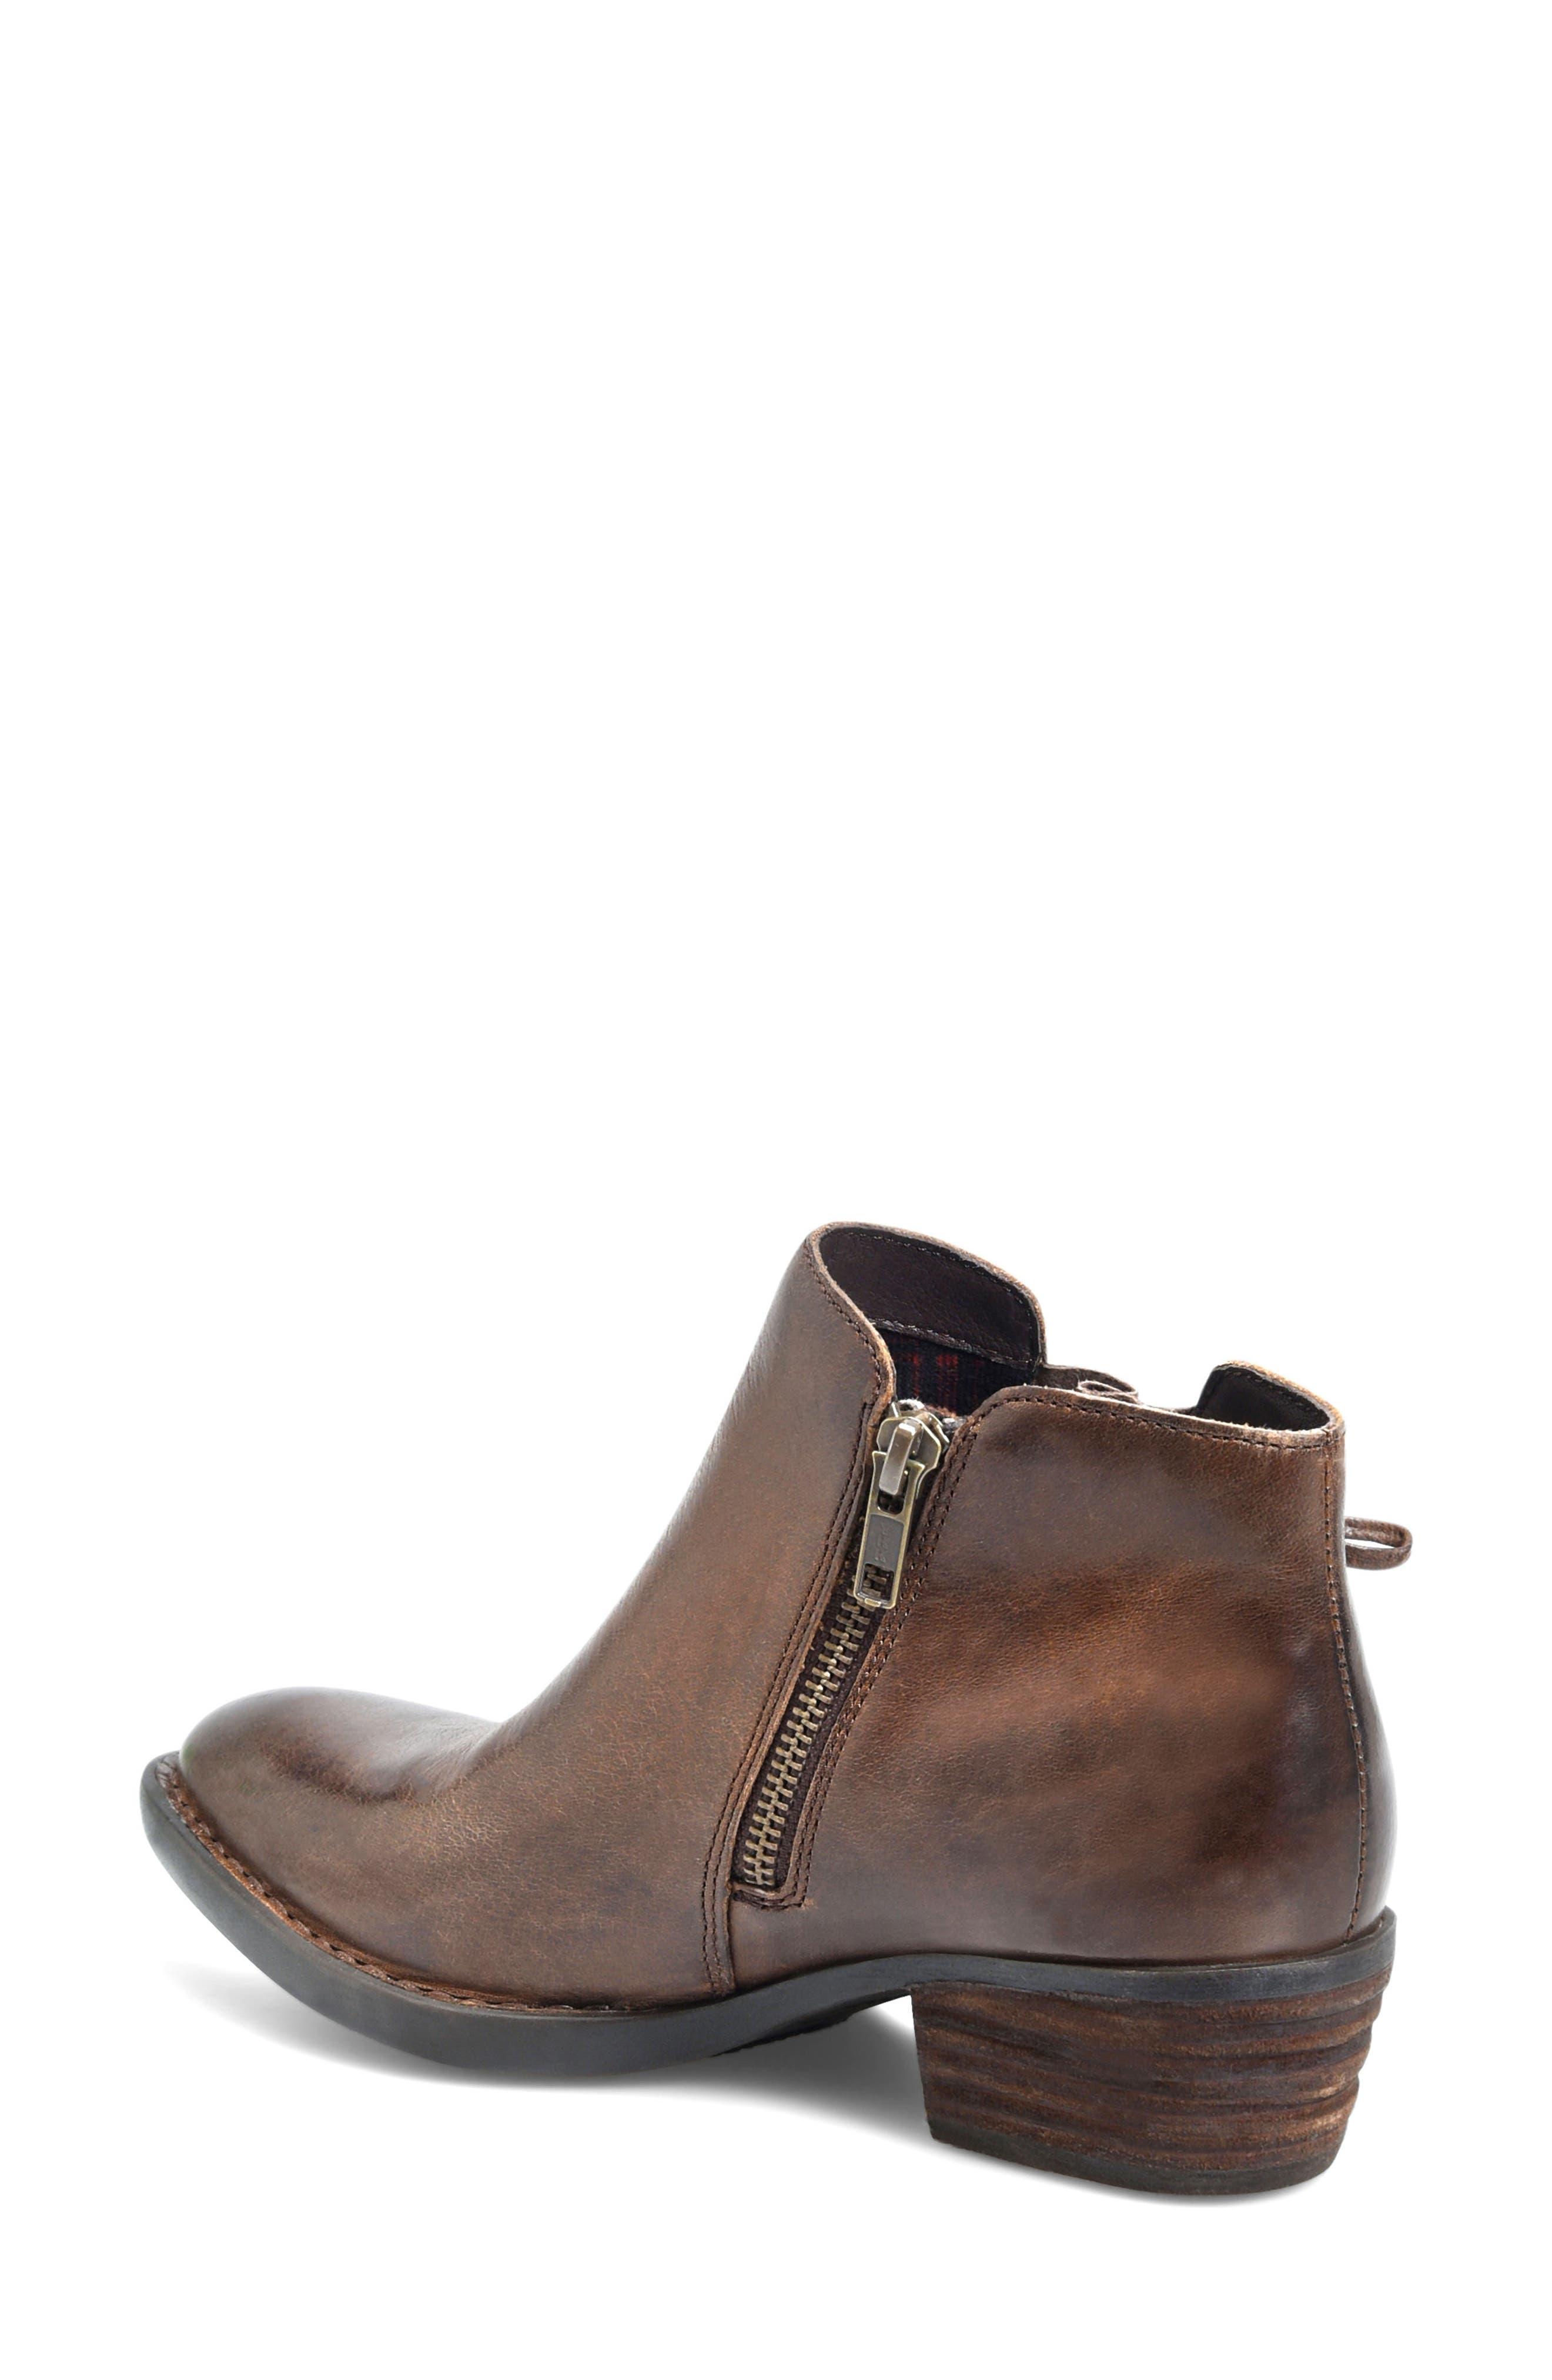 Bowlen Bootie,                             Alternate thumbnail 2, color,                             Brown Leather